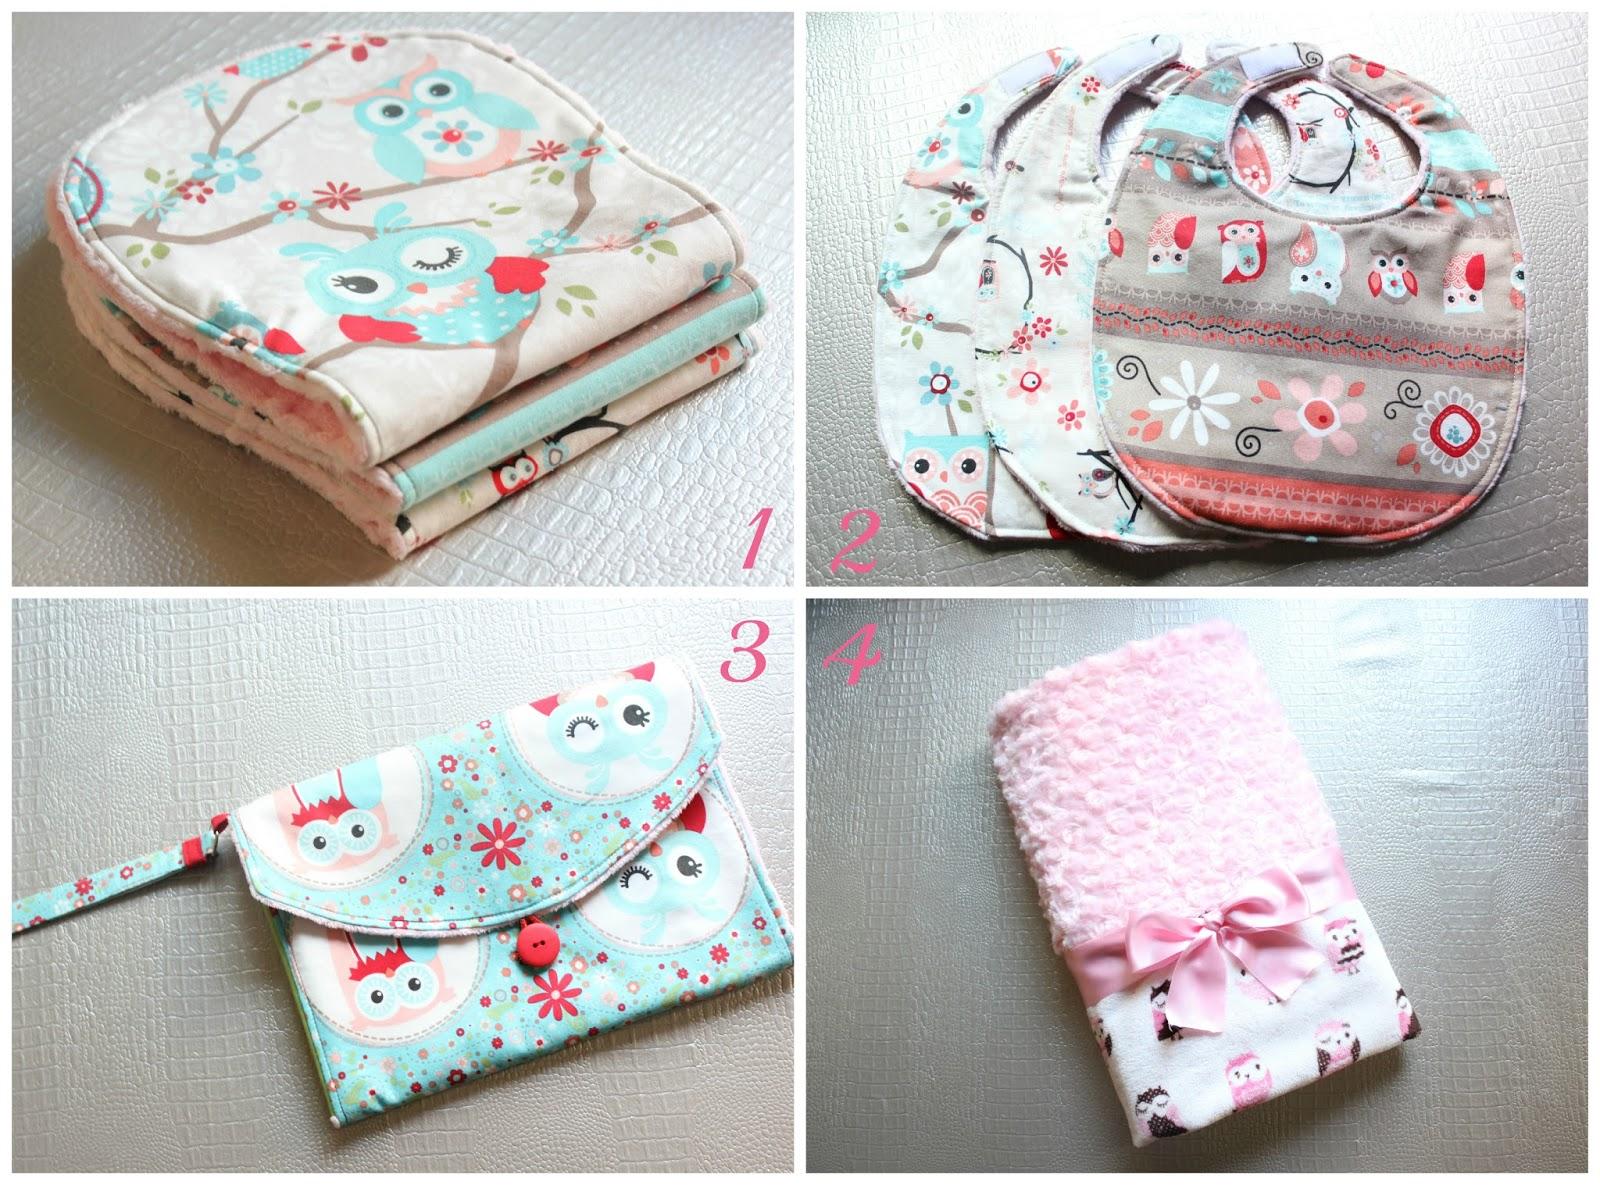 Inspiraciones ideas de regalos para beb s aprender for Facilisimo com manualidades